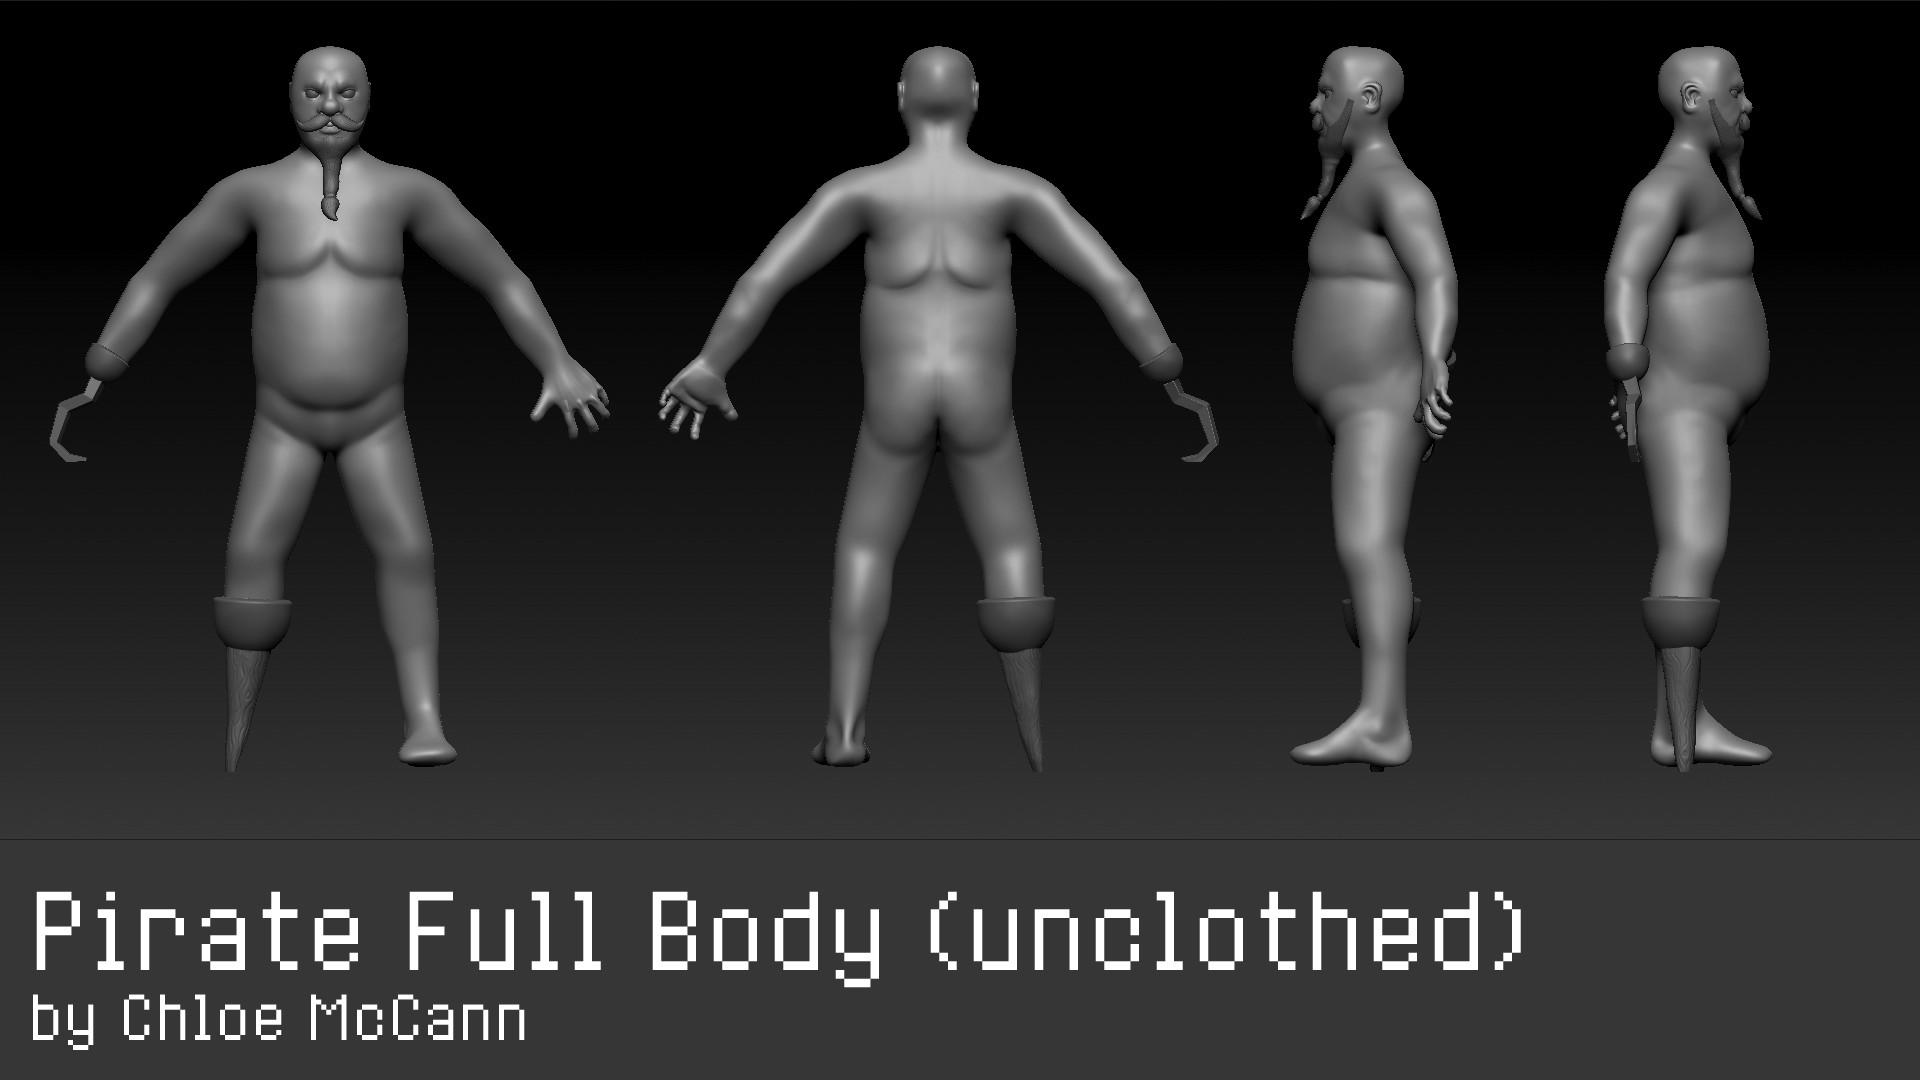 Chloe mccann full body unclothed